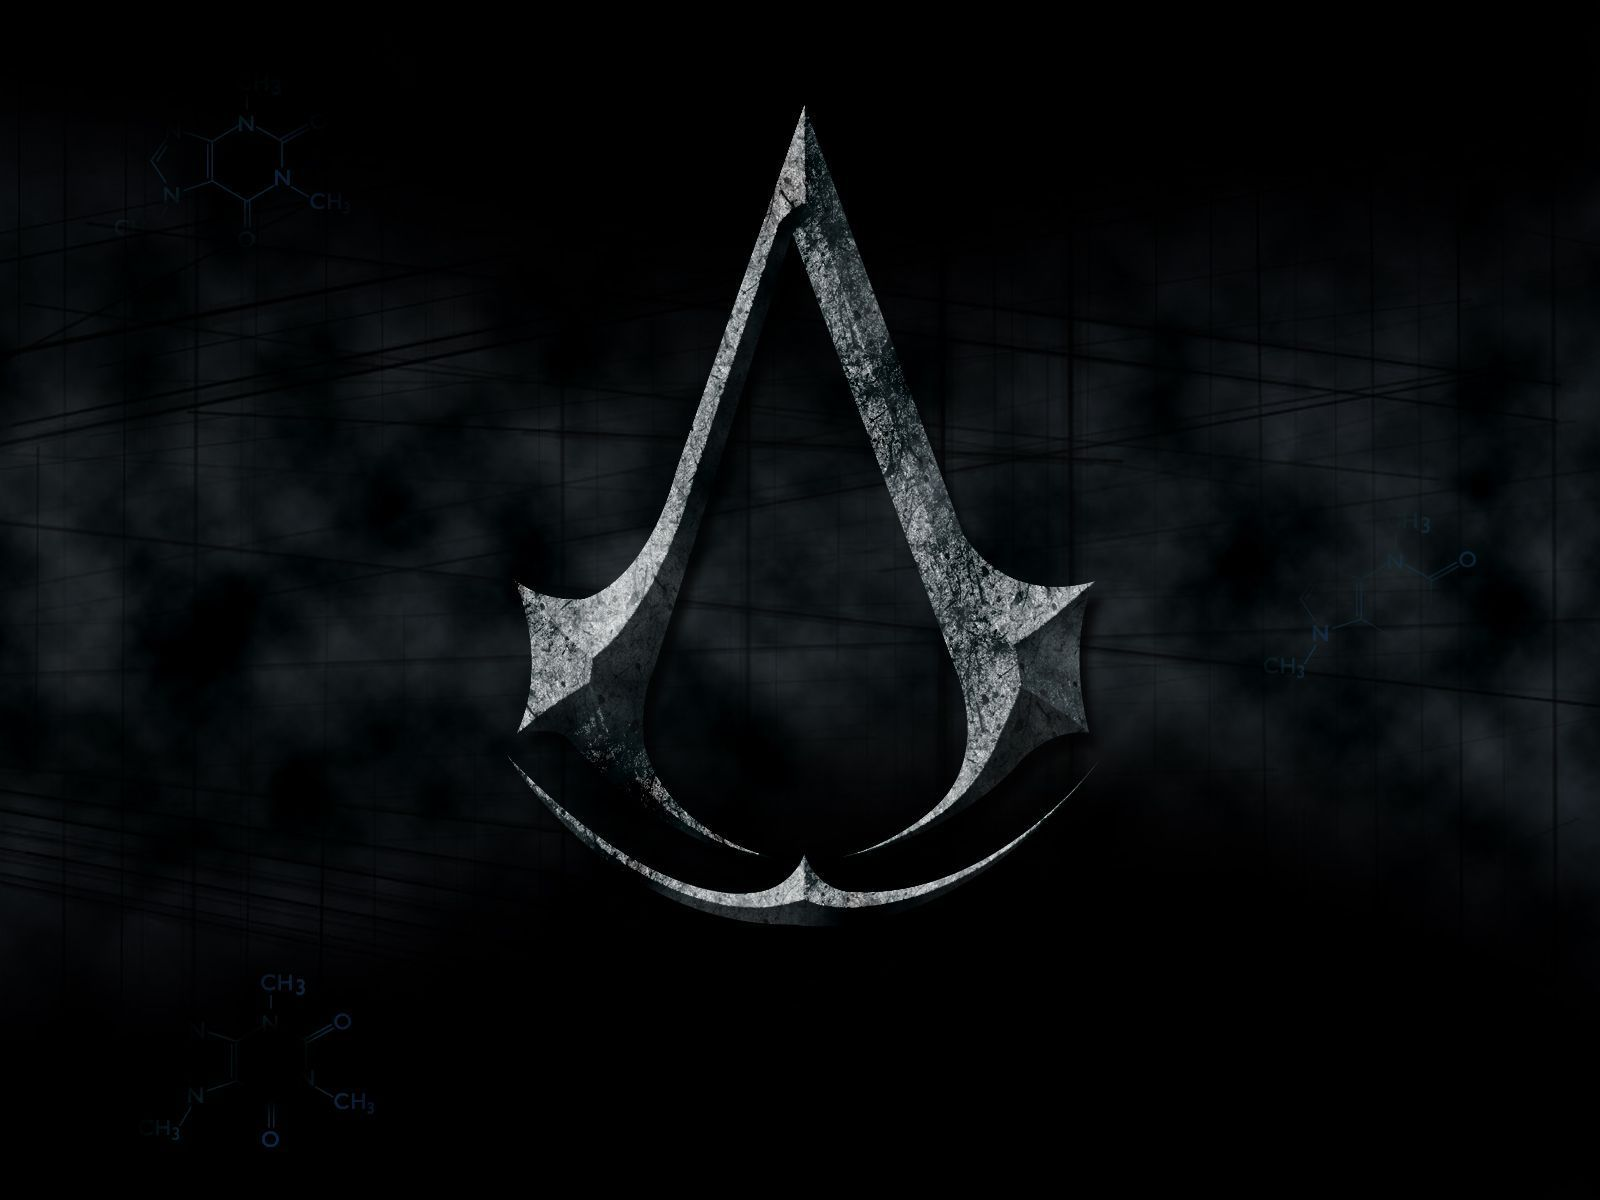 Assassins Creed Wallpapers HD Wallpaper 1920×1080 Assassin.